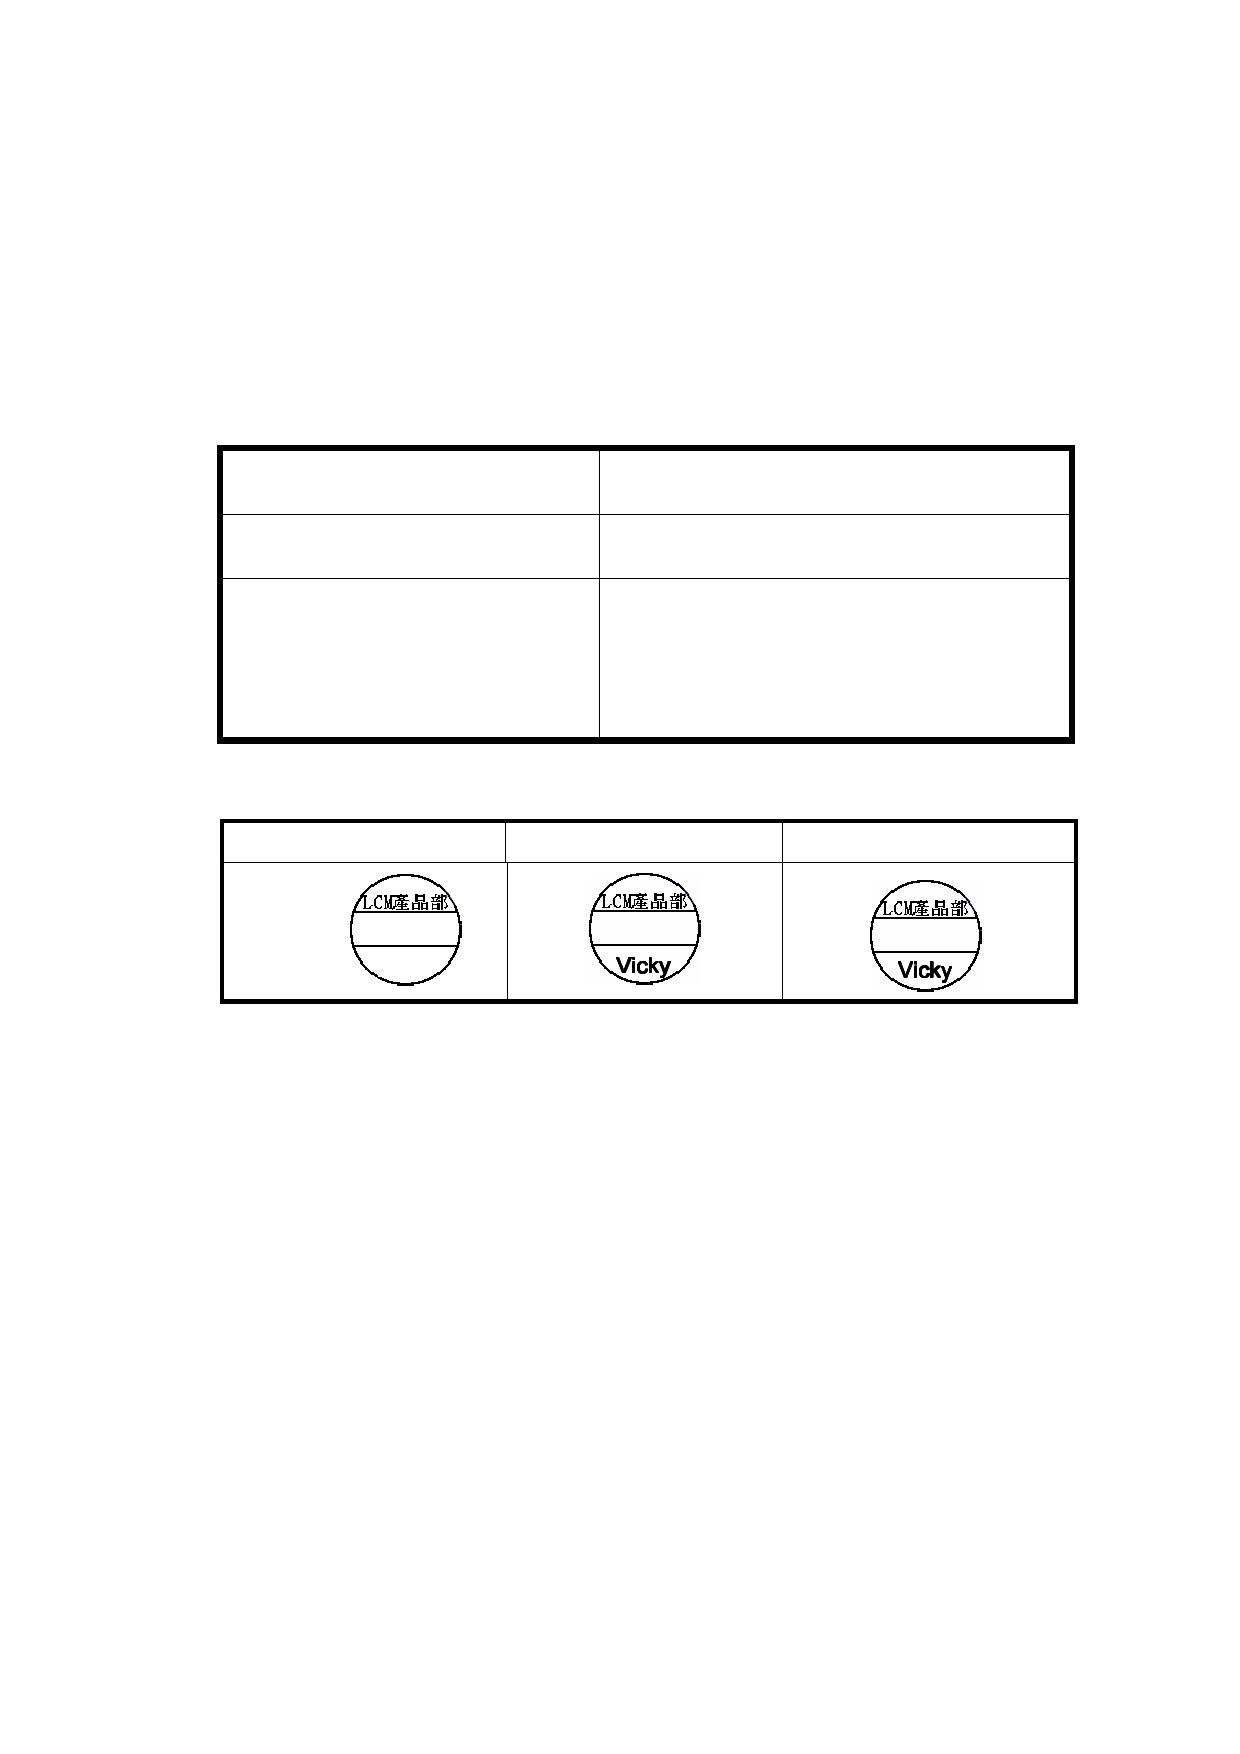 I2420-6OMN4823A datasheet